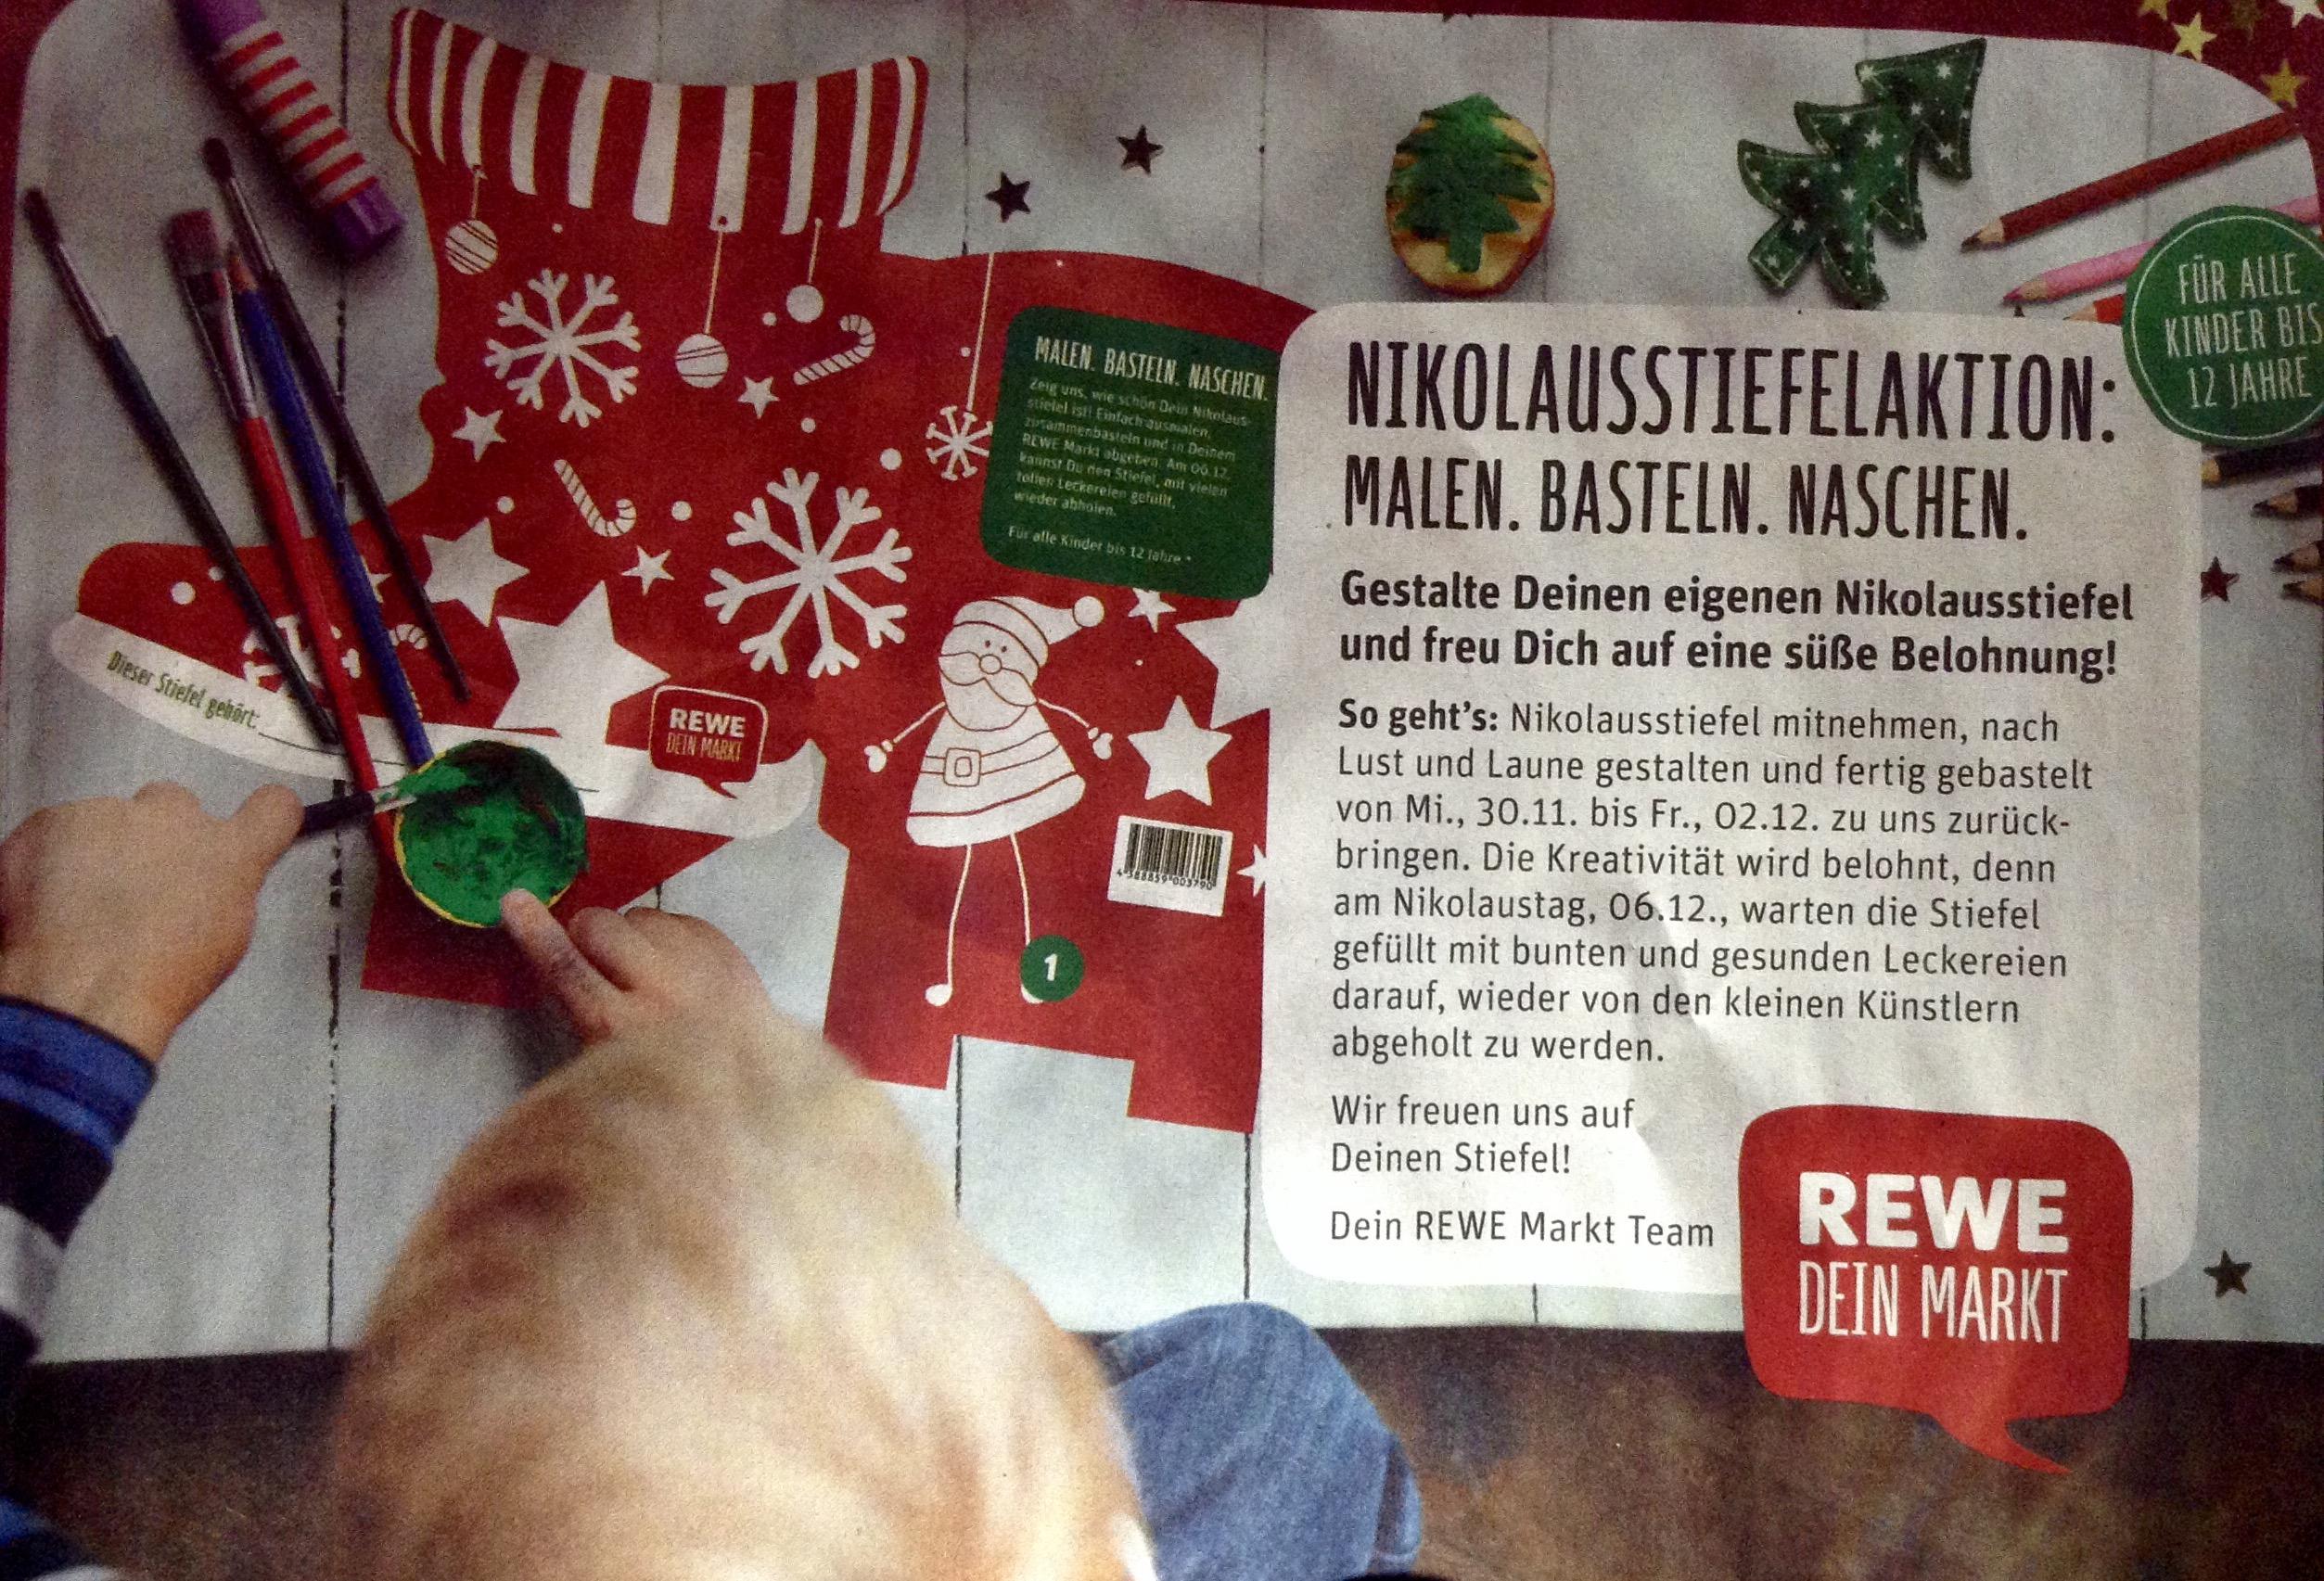 REWE Nikolausstiefelaktion 2016